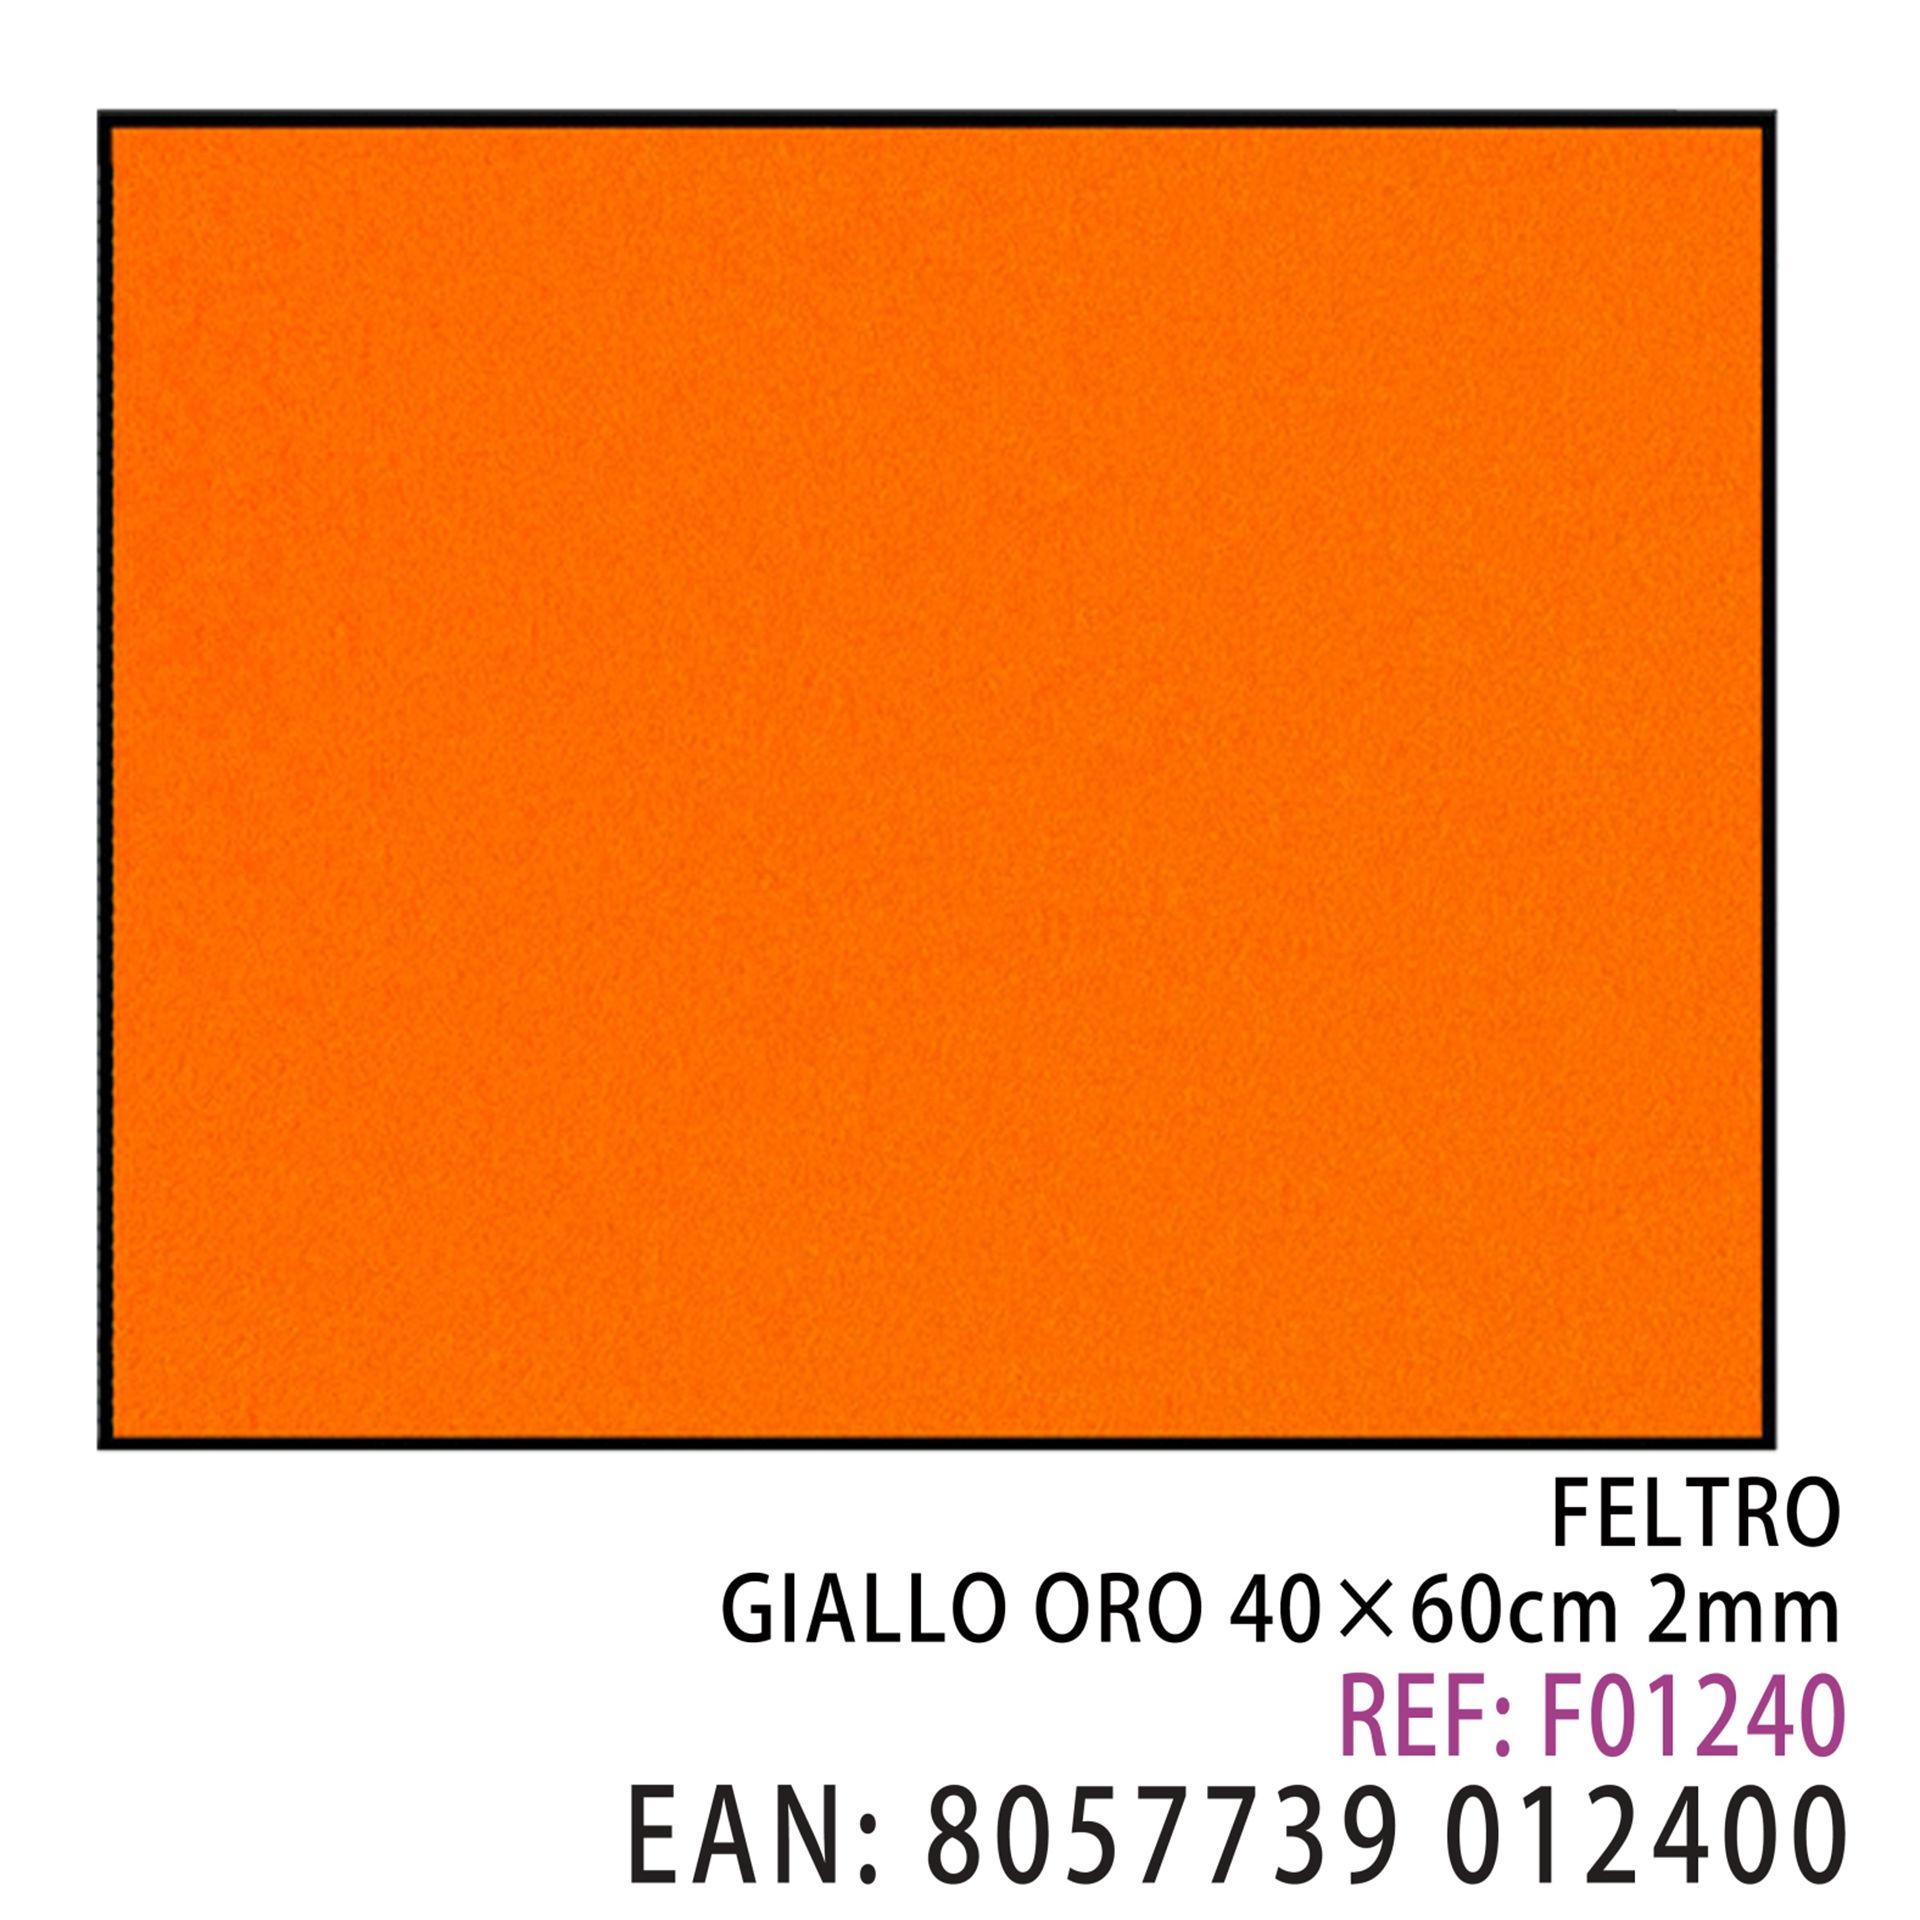 FELTRO GIALLO ORO  40 X 60CM X 2MMDz